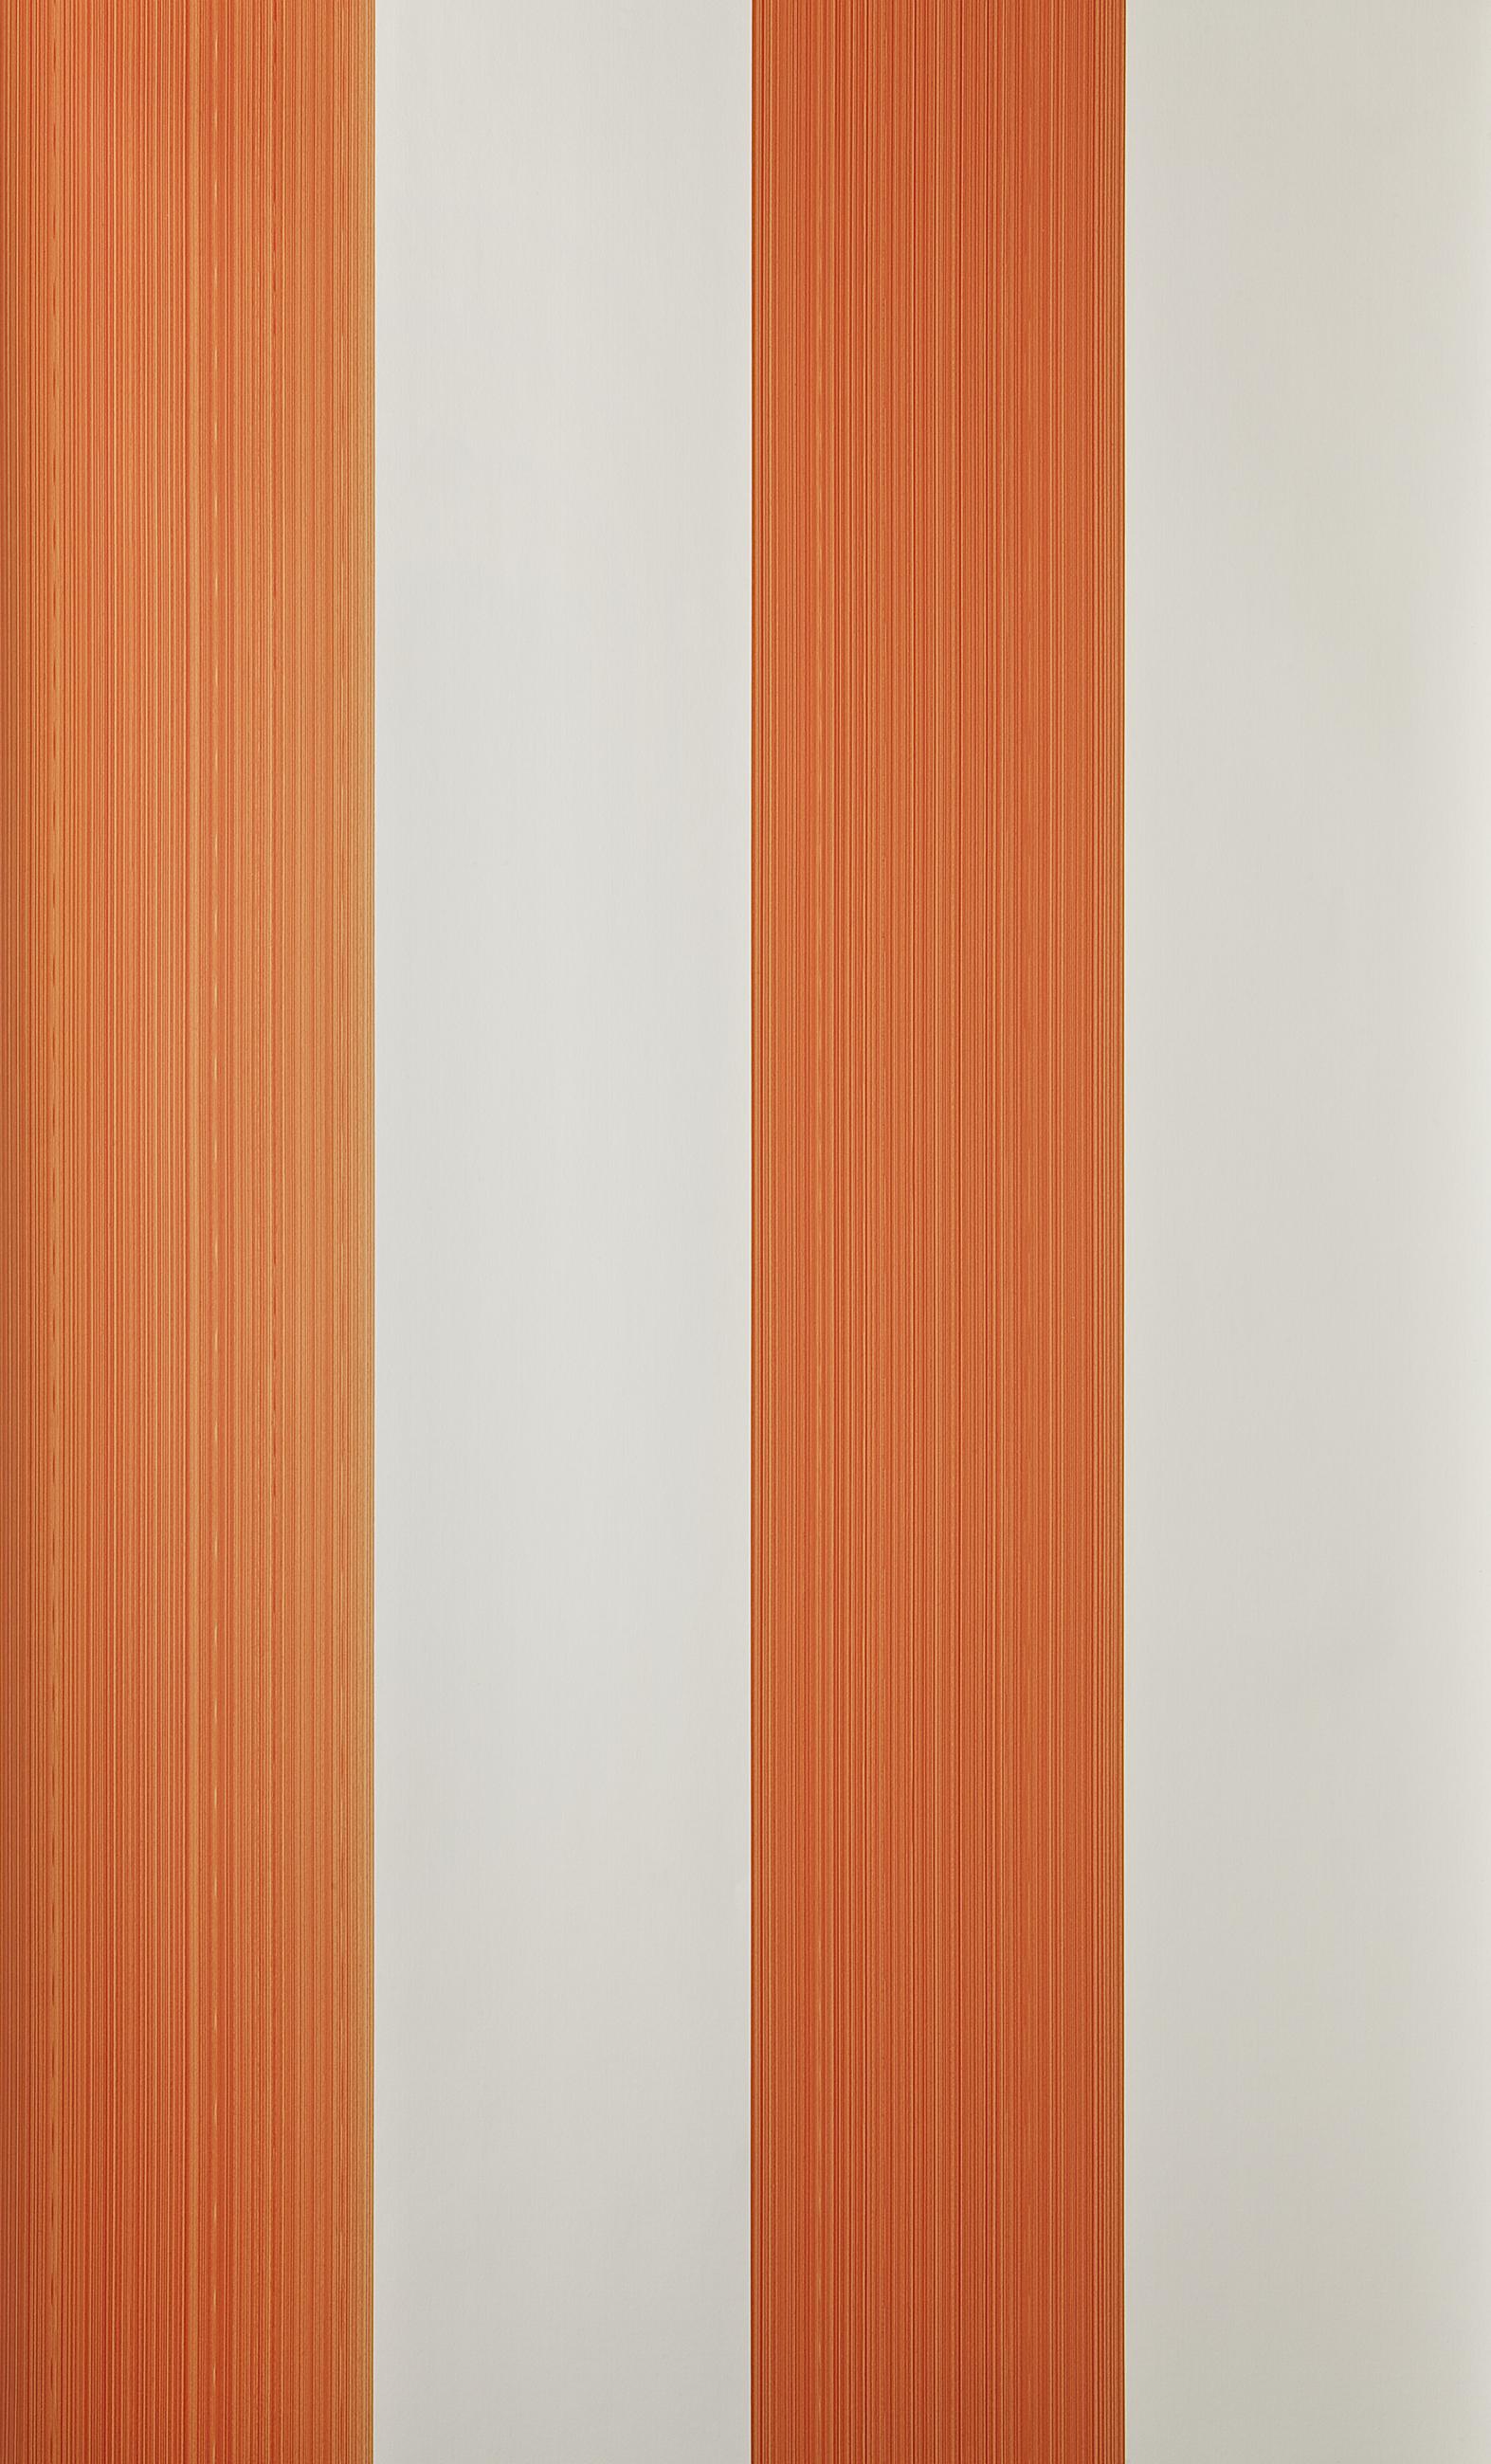 Broad Stripe 13102 $195 Per Roll  Order Now